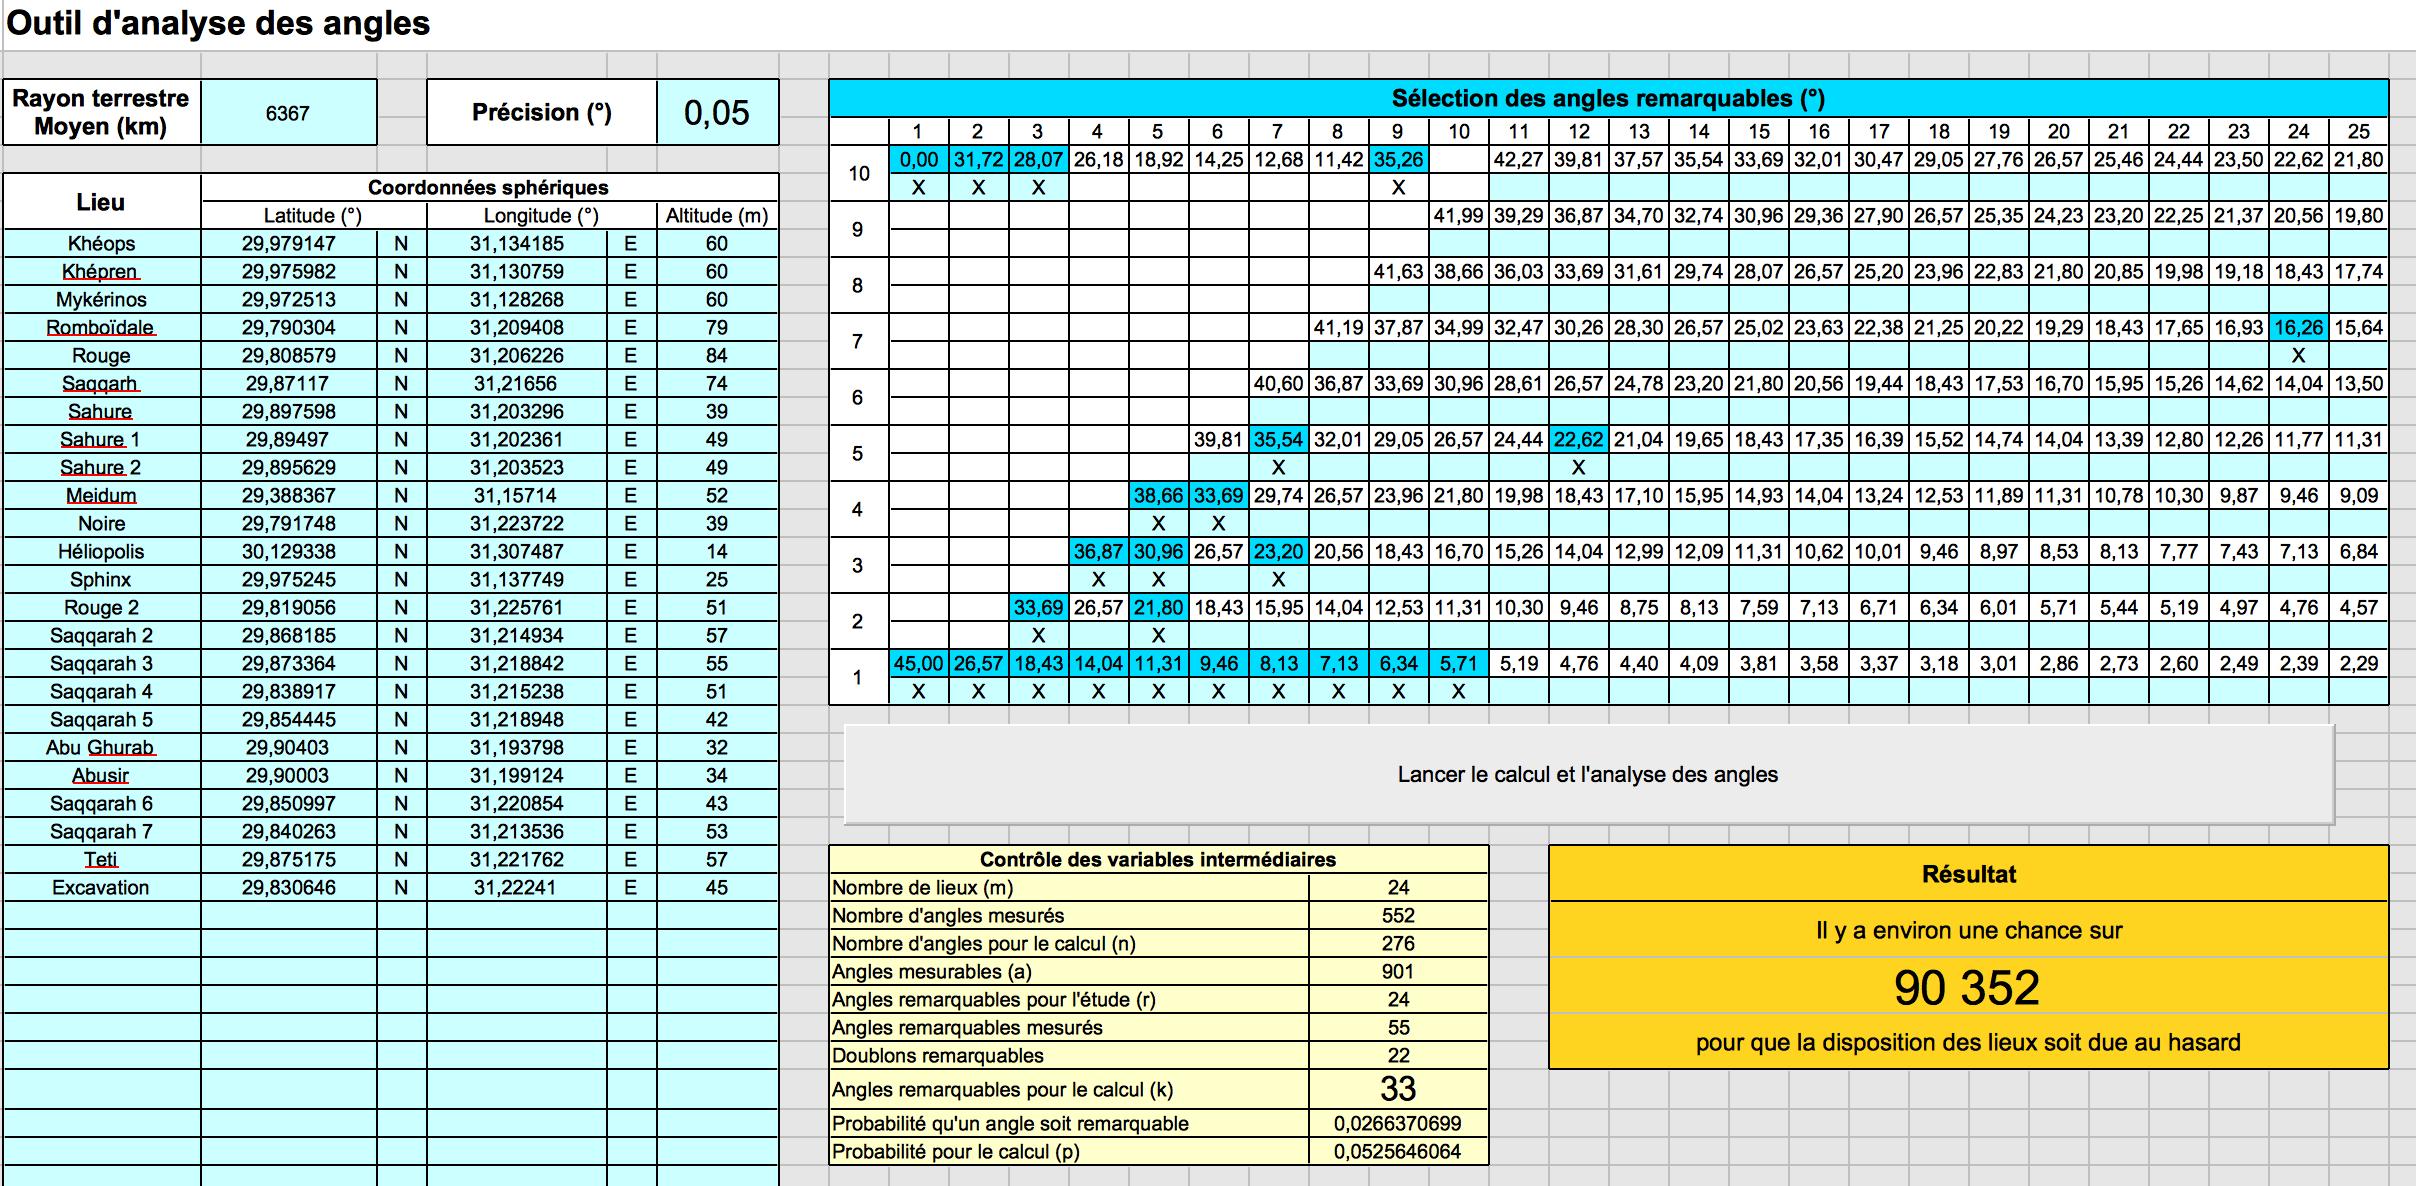 2017-11-06 11:10:36